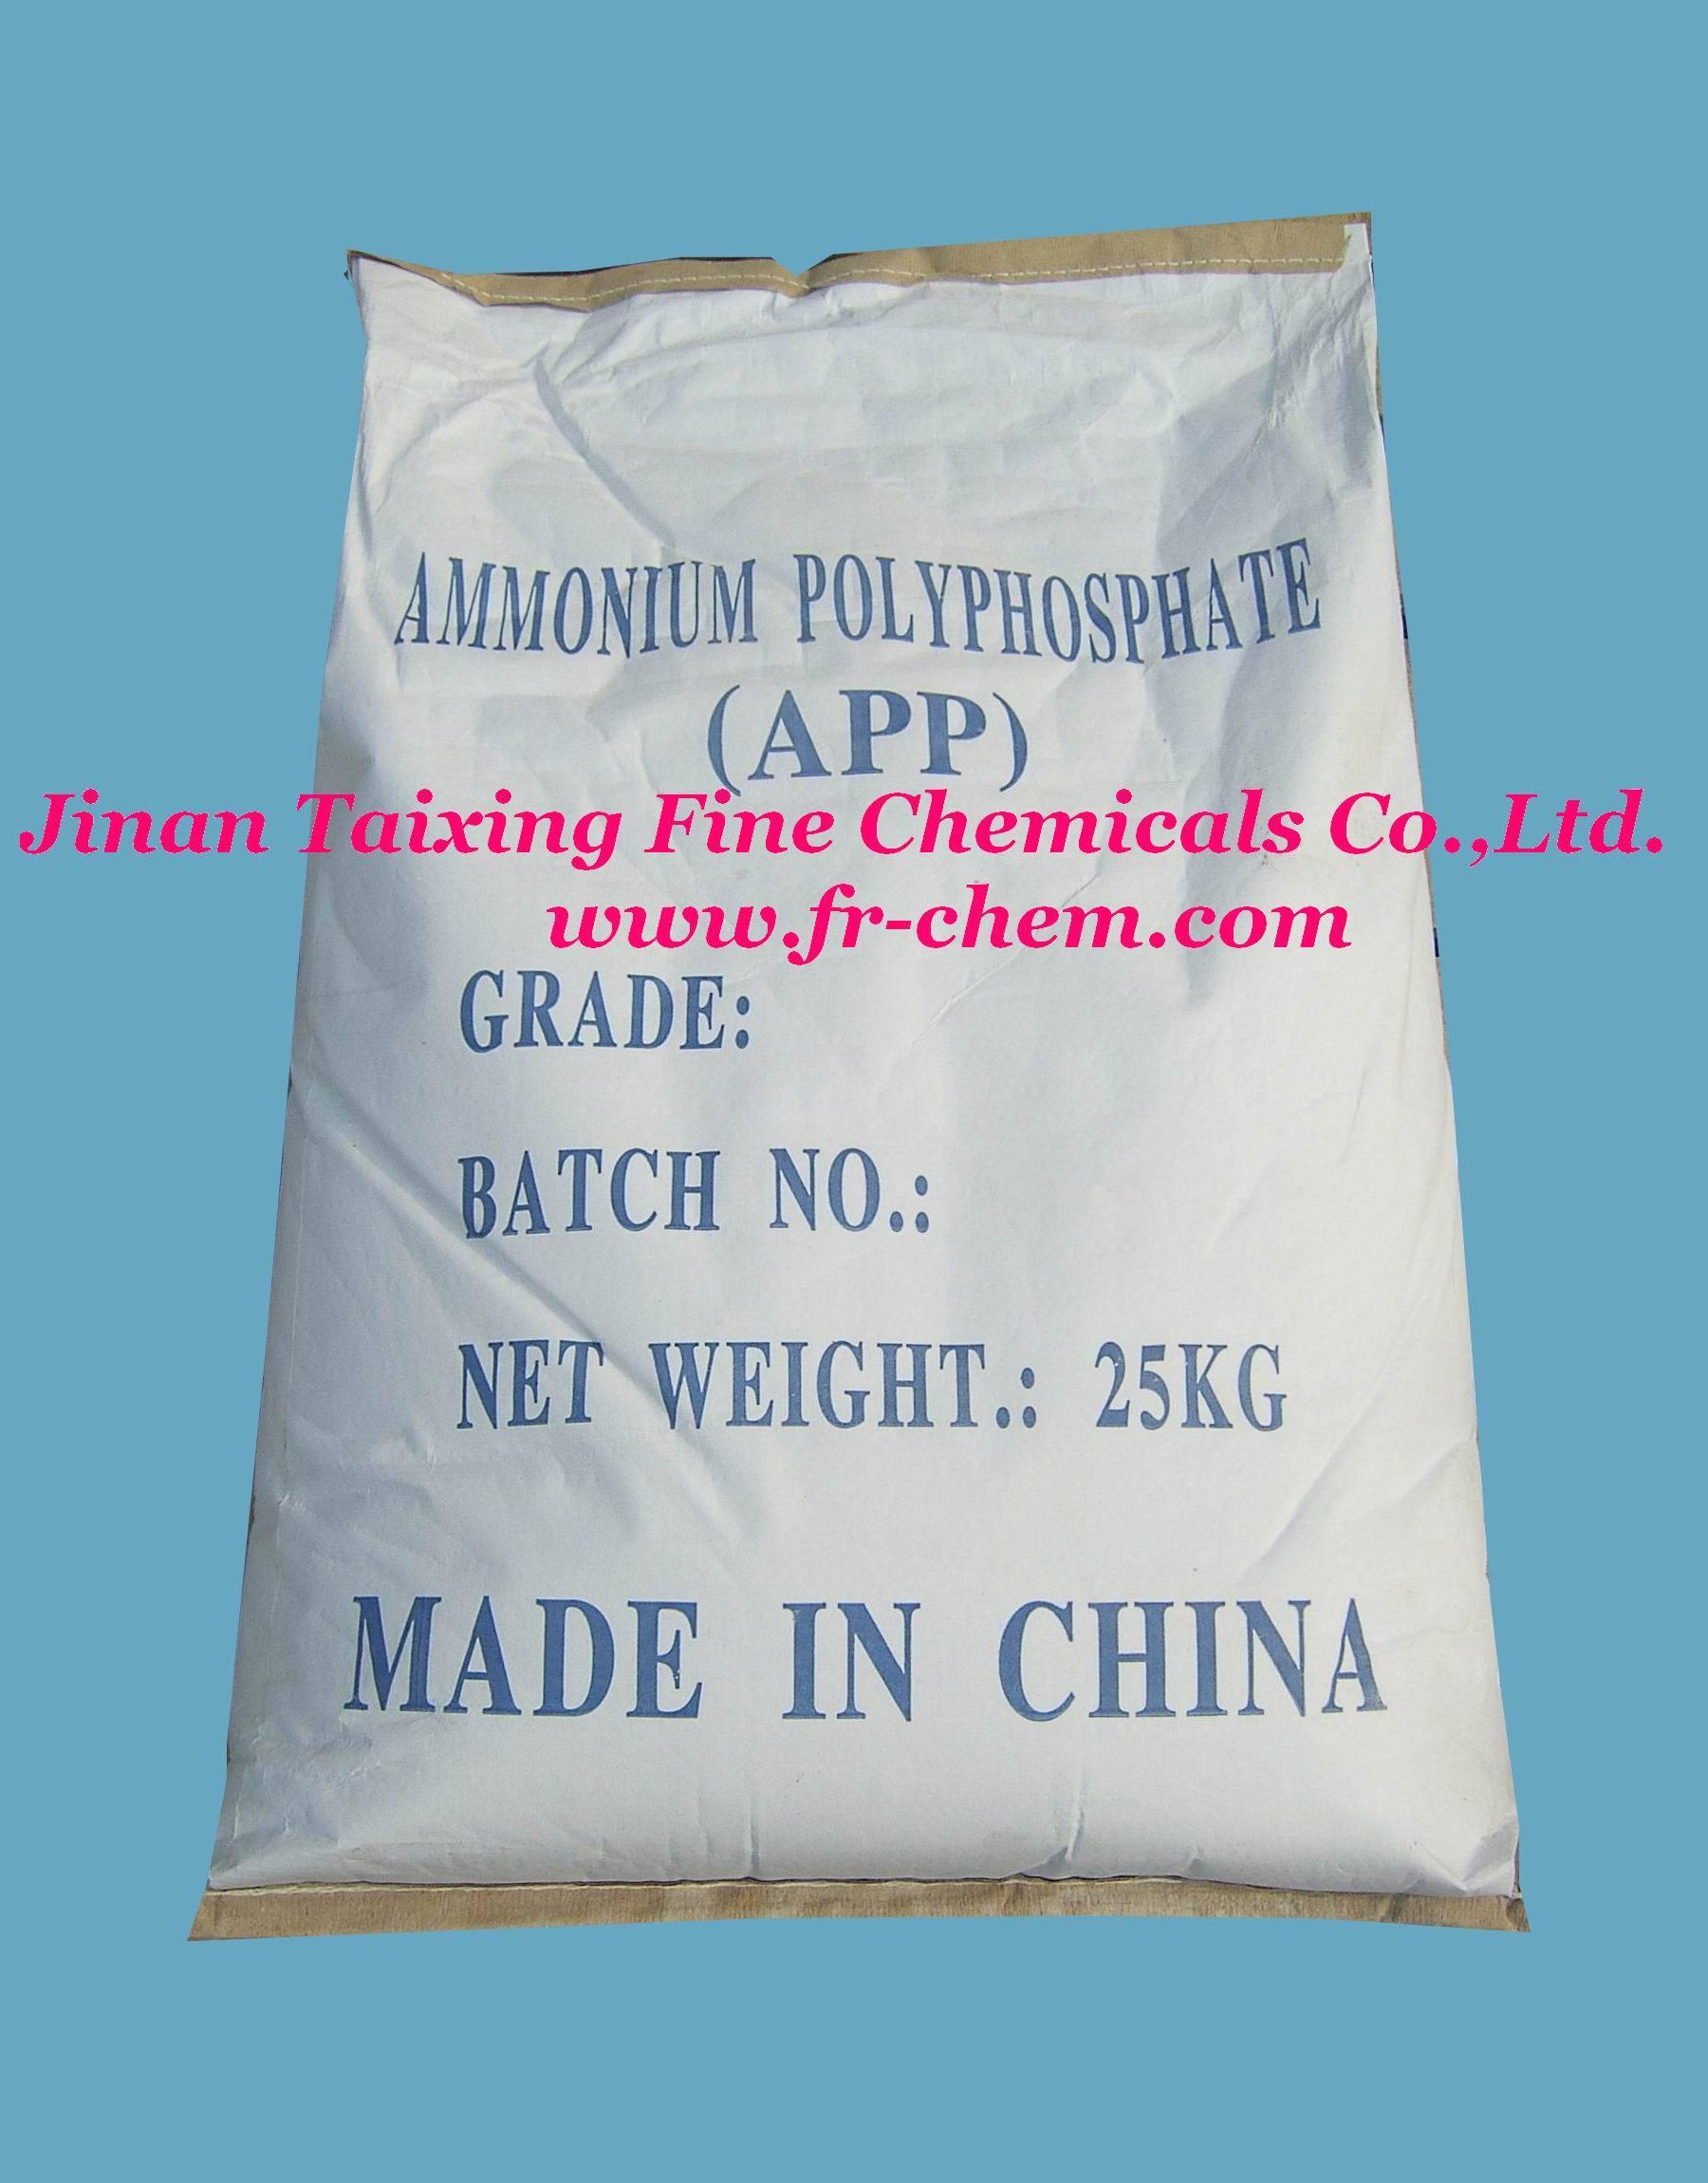 water-resistant Ammonium polyphosphate